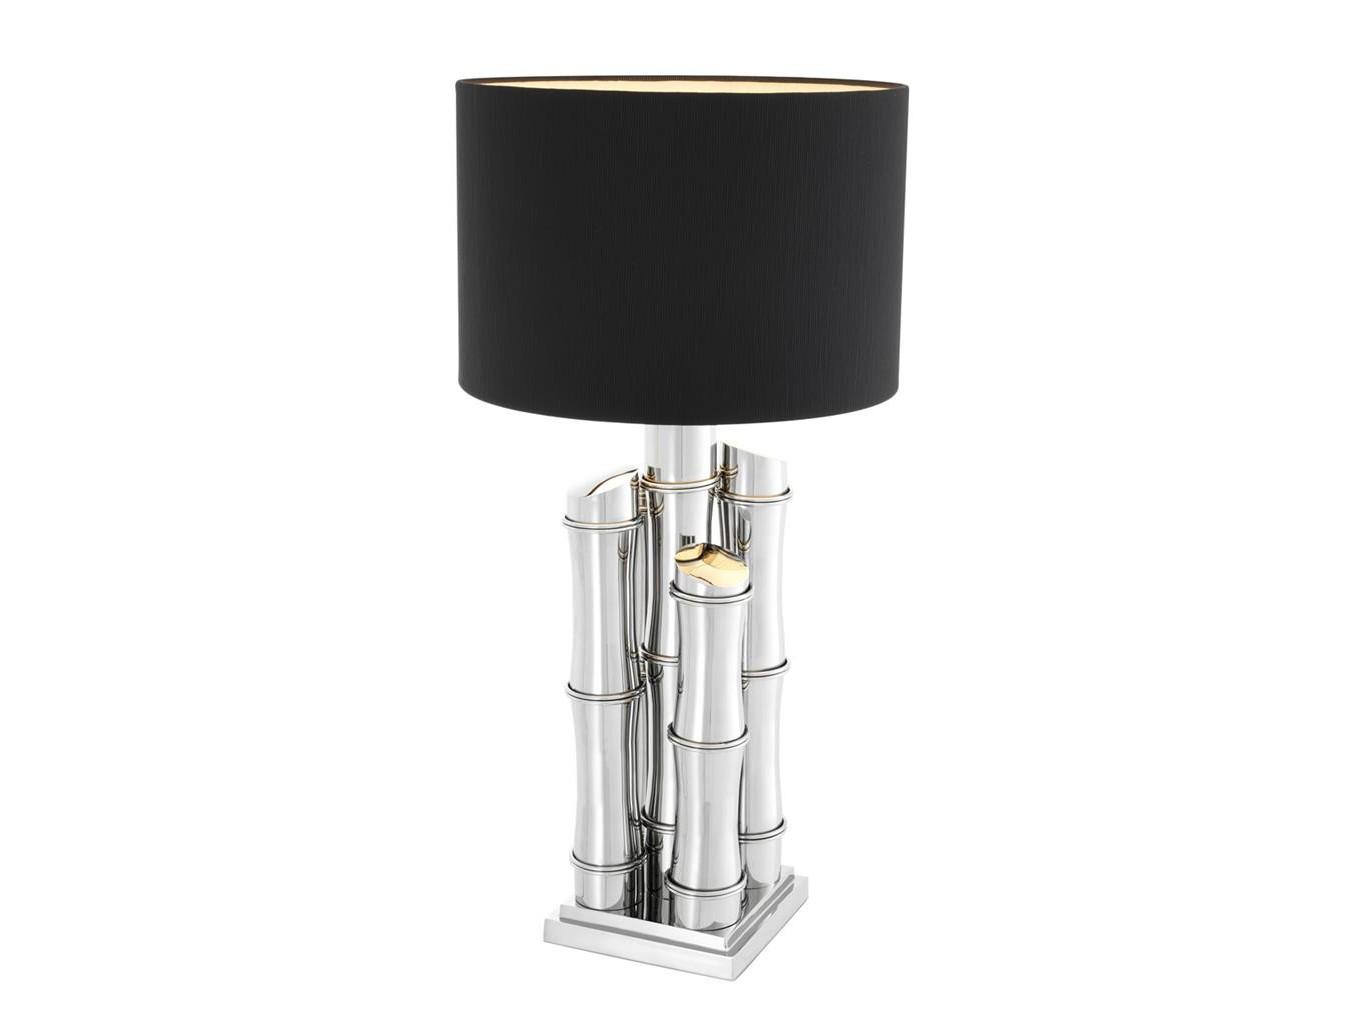 Настольная лампа DamianДекоративные лампы<br><br><br>Material: Текстиль<br>Ширина см: 45.0<br>Высота см: 91<br>Глубина см: 45.0